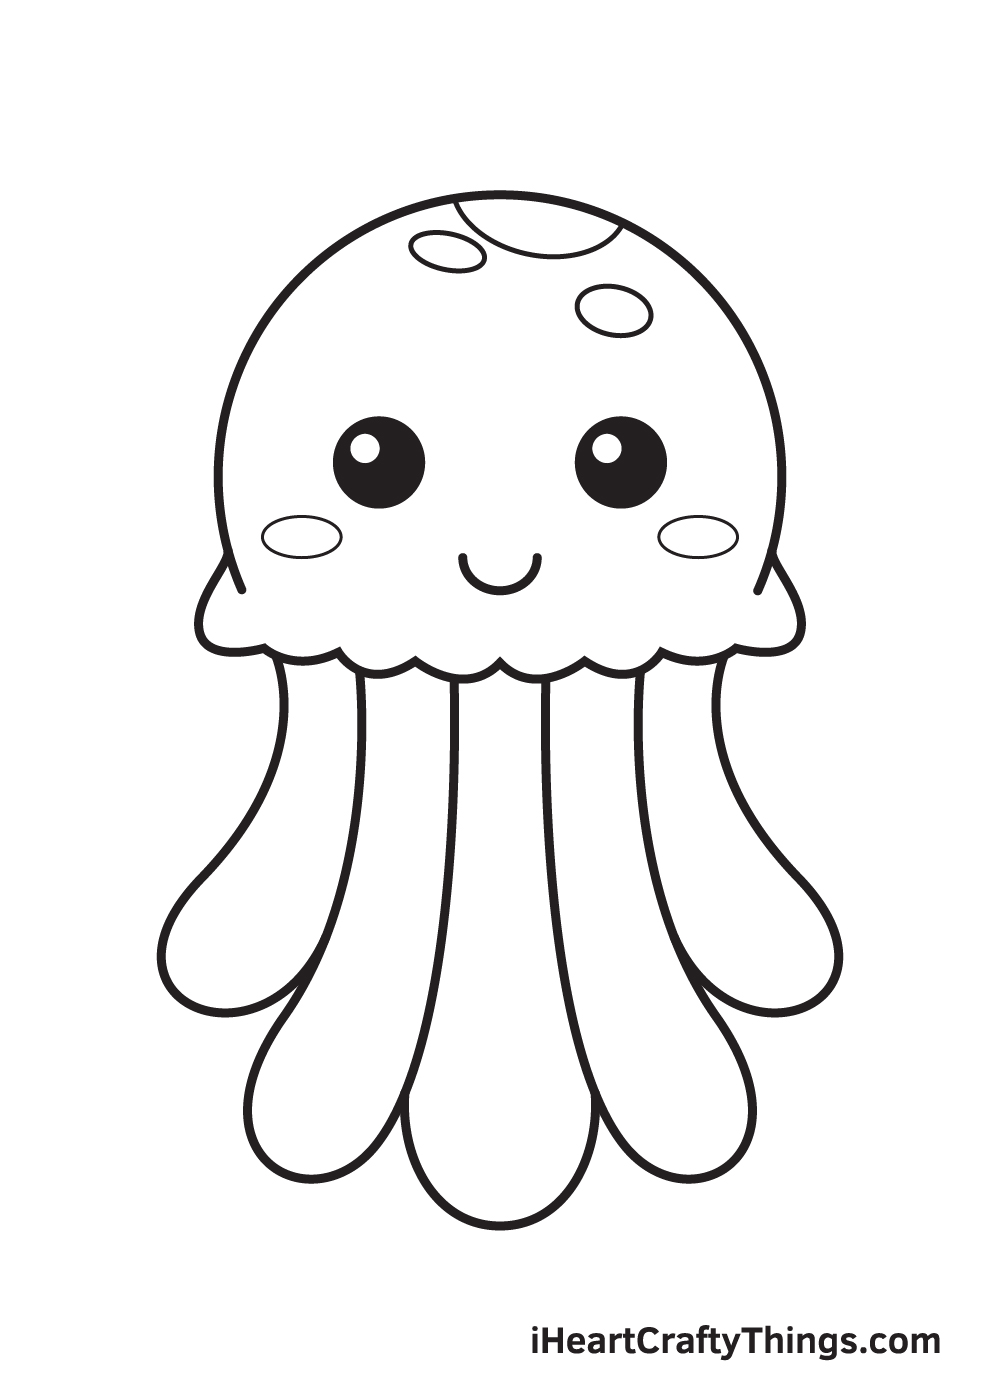 jellyfish drawing step 9